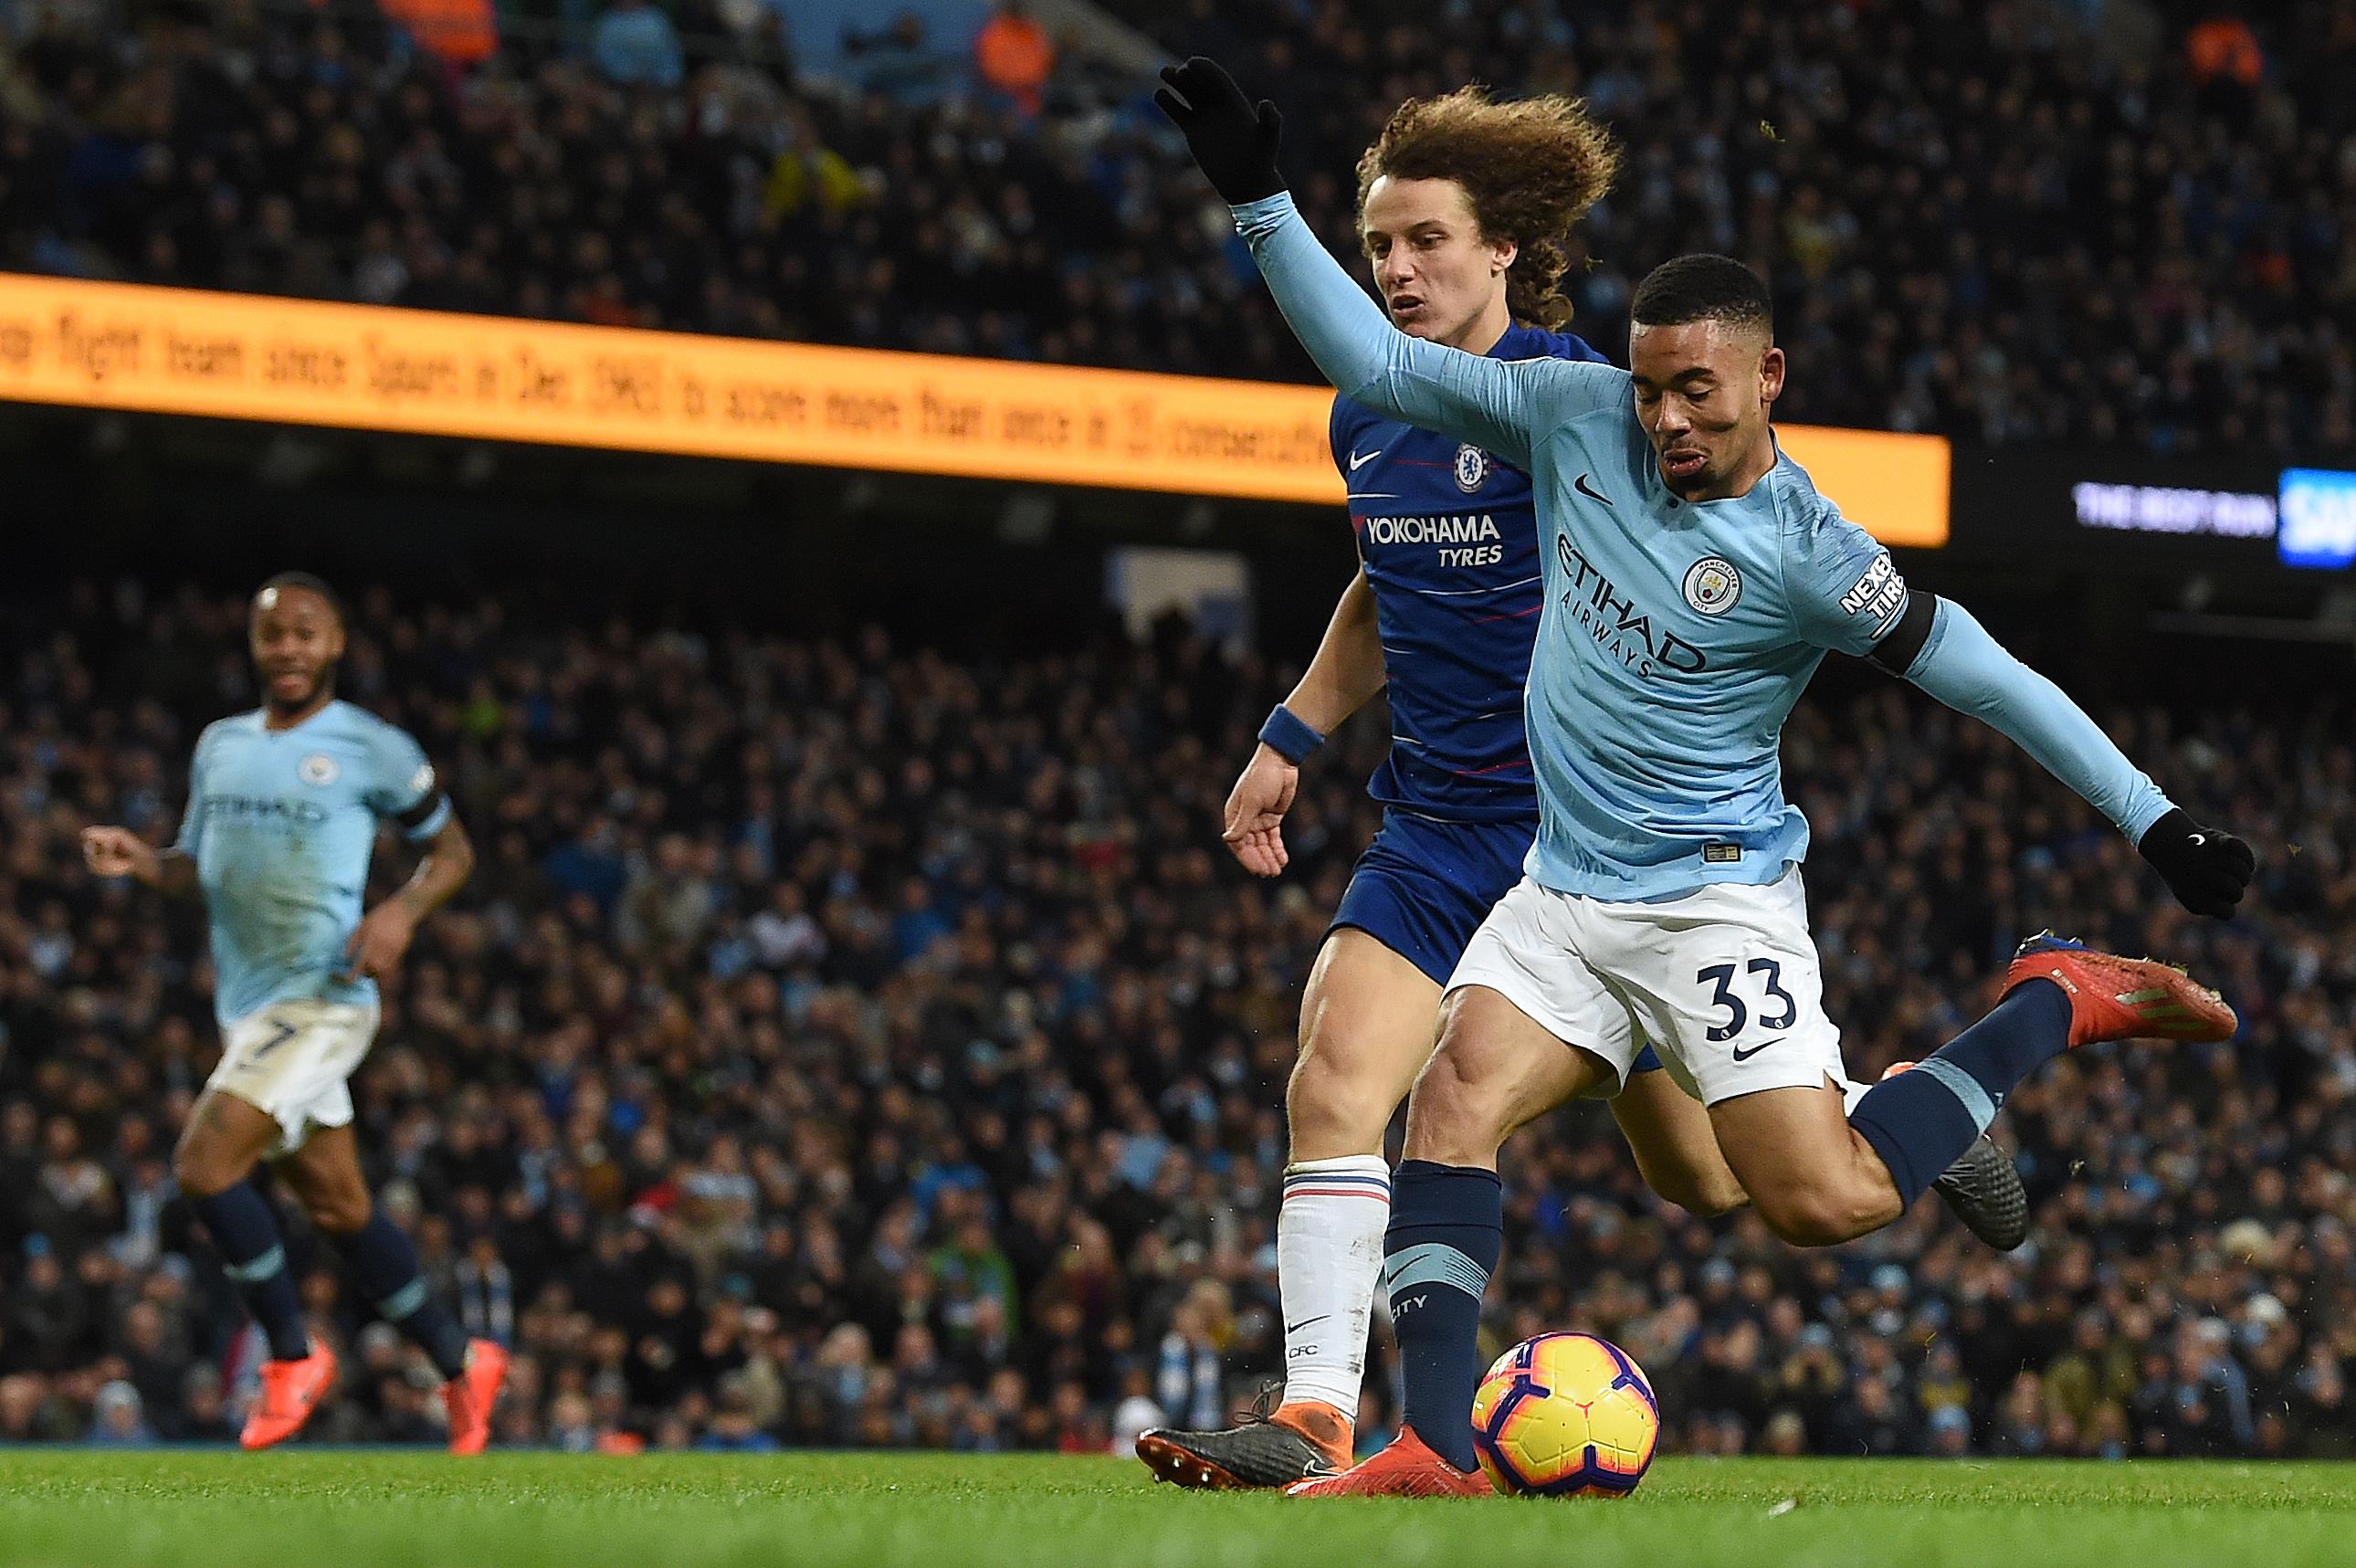 6-0-ra verte a Manchester City a Chelsea-t